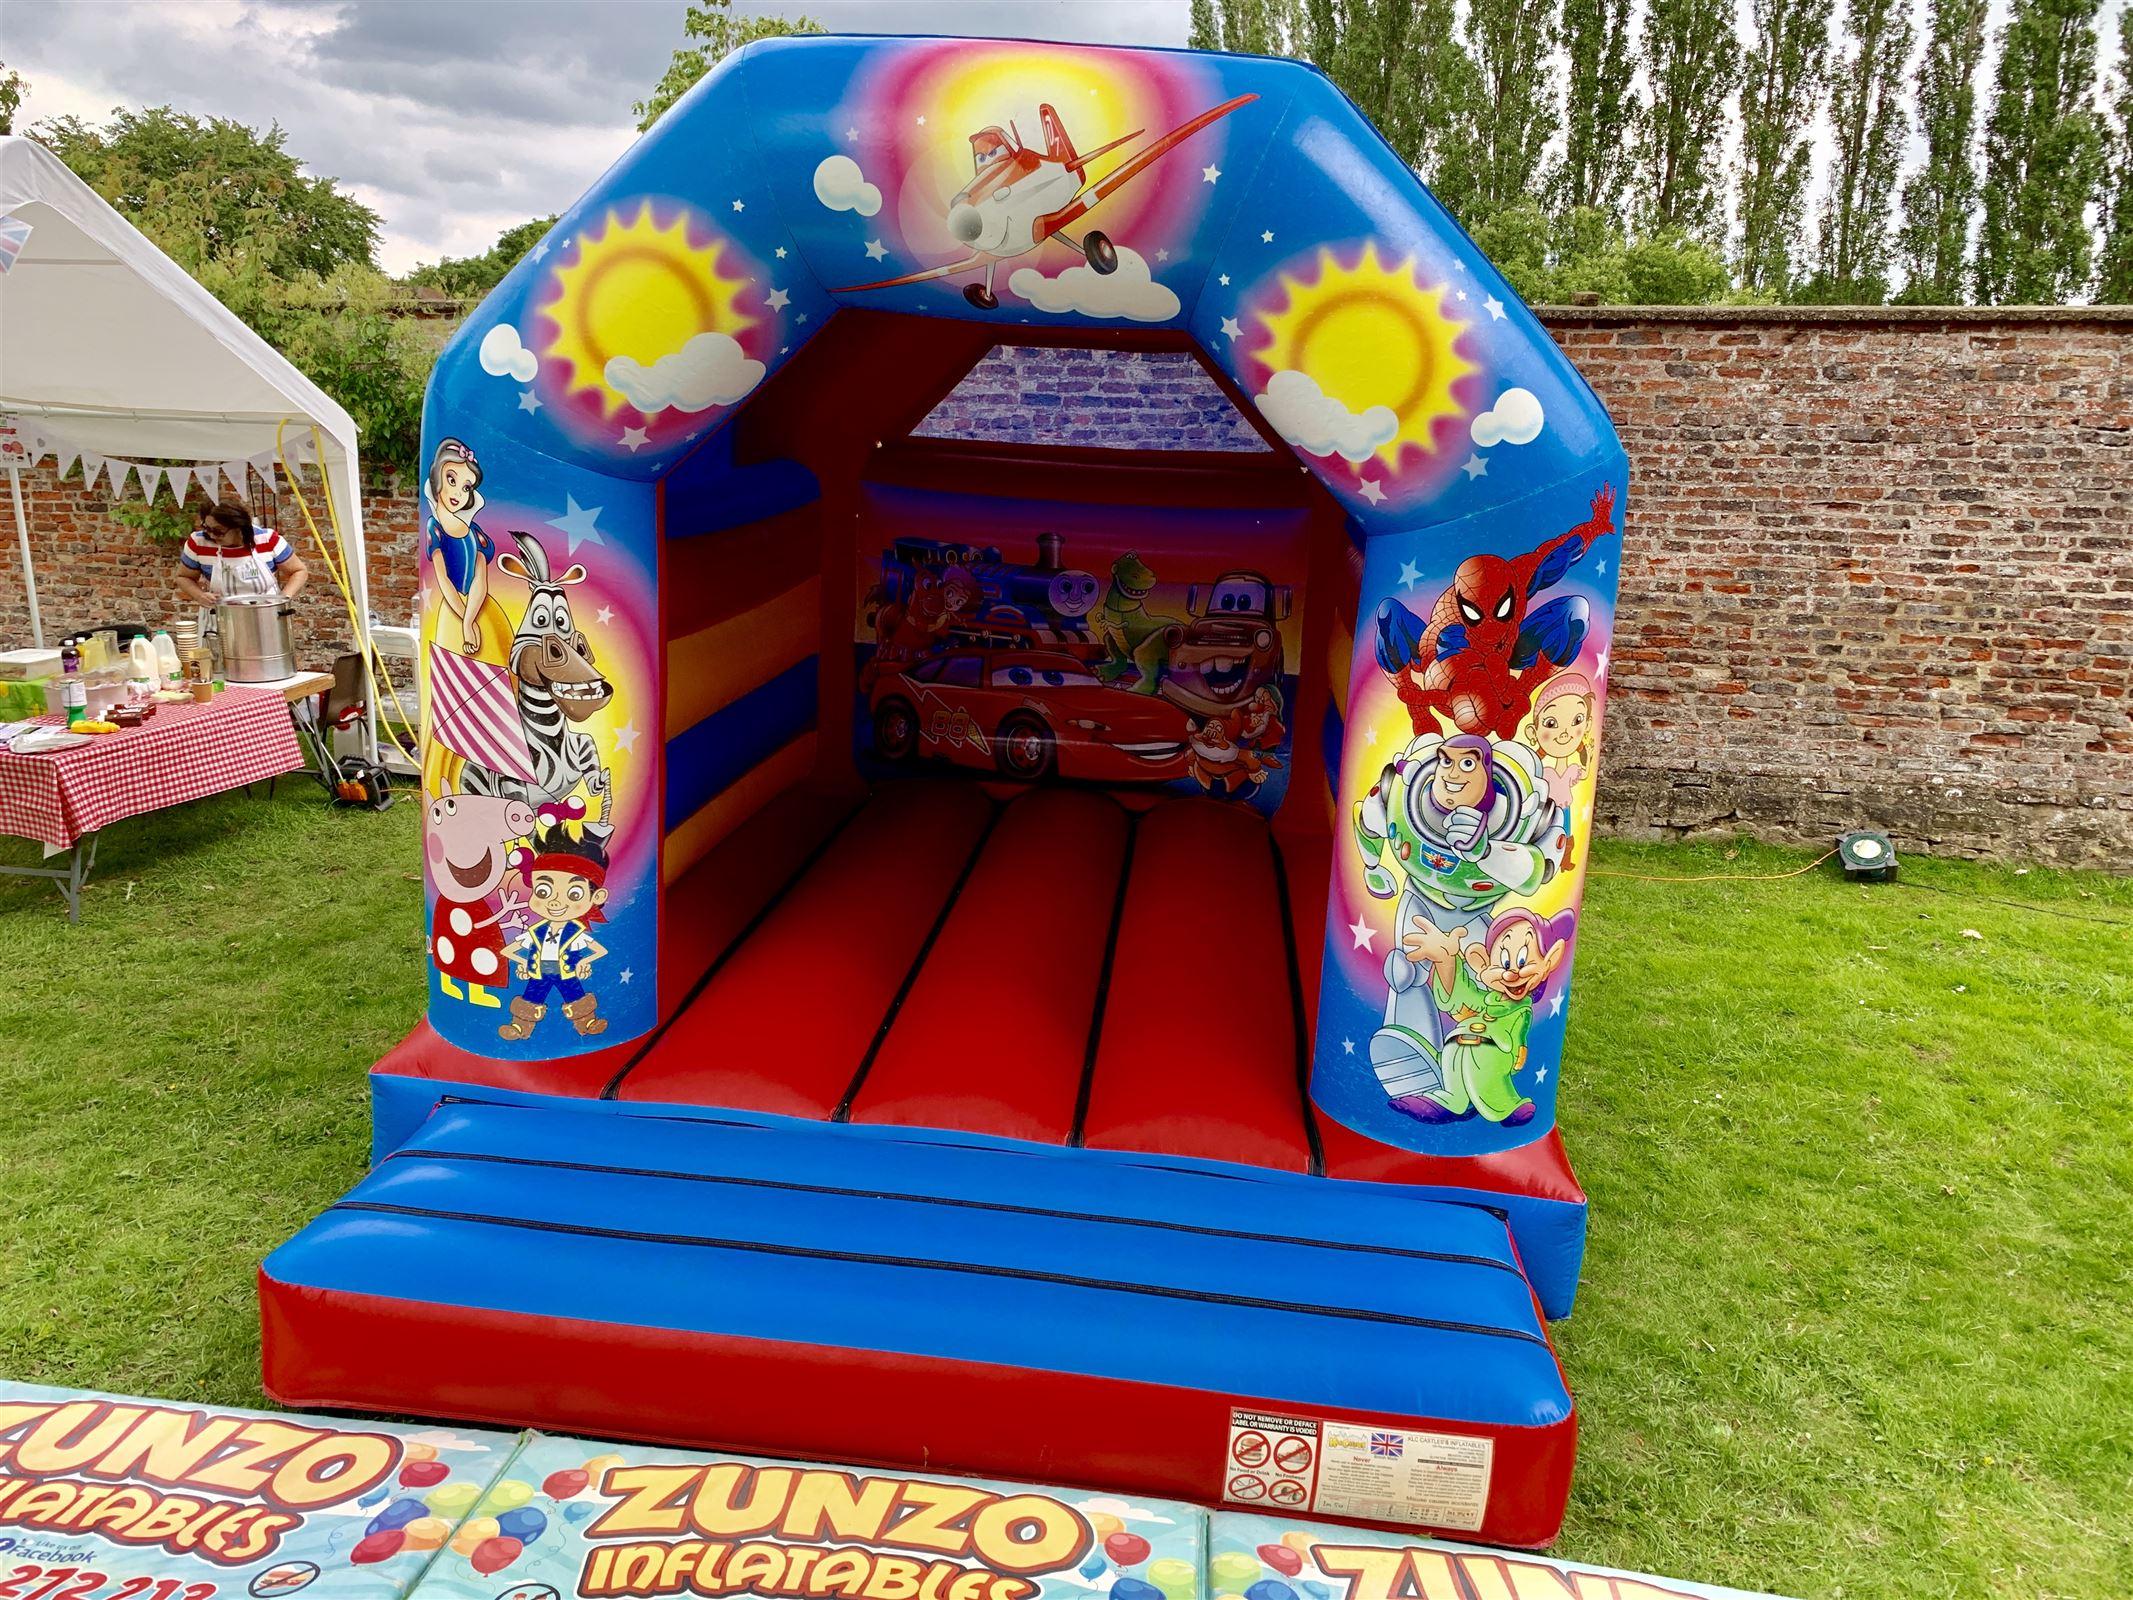 gaixample.org Royalbeach Bouncy Castle Castle 16030 Toys & Games ...